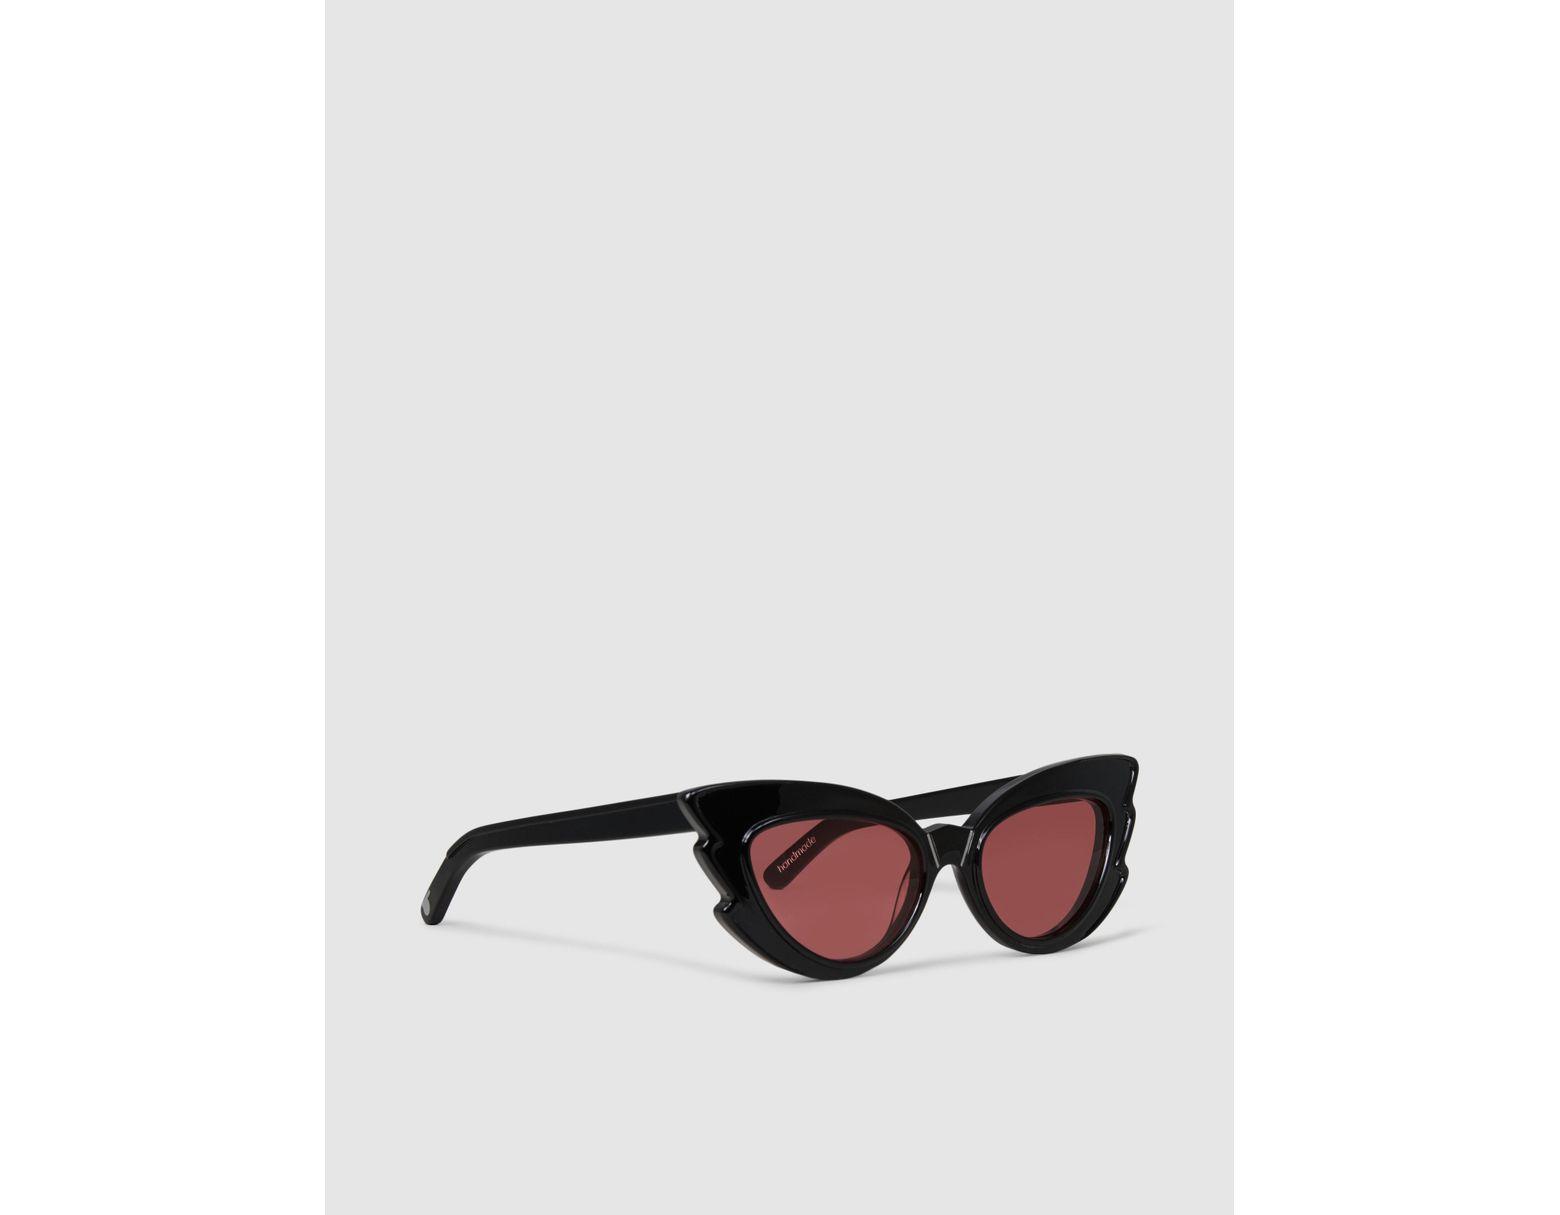 09a2d95656ad Pared Eyewear Stargazers Cat-eye Acetate Sunglasses in Black - Lyst